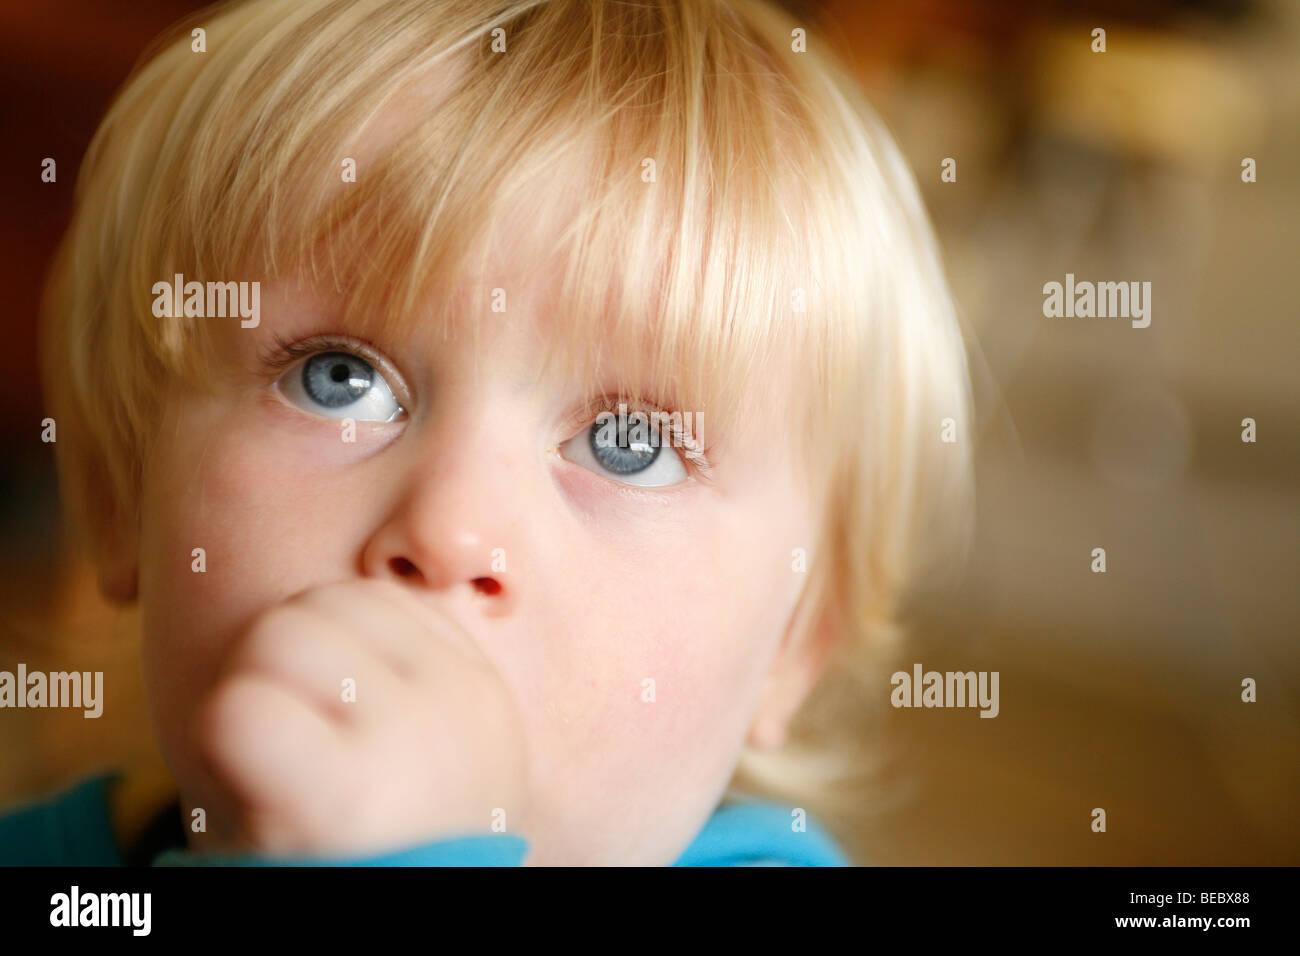 young boy sucking thumb Stock Photo